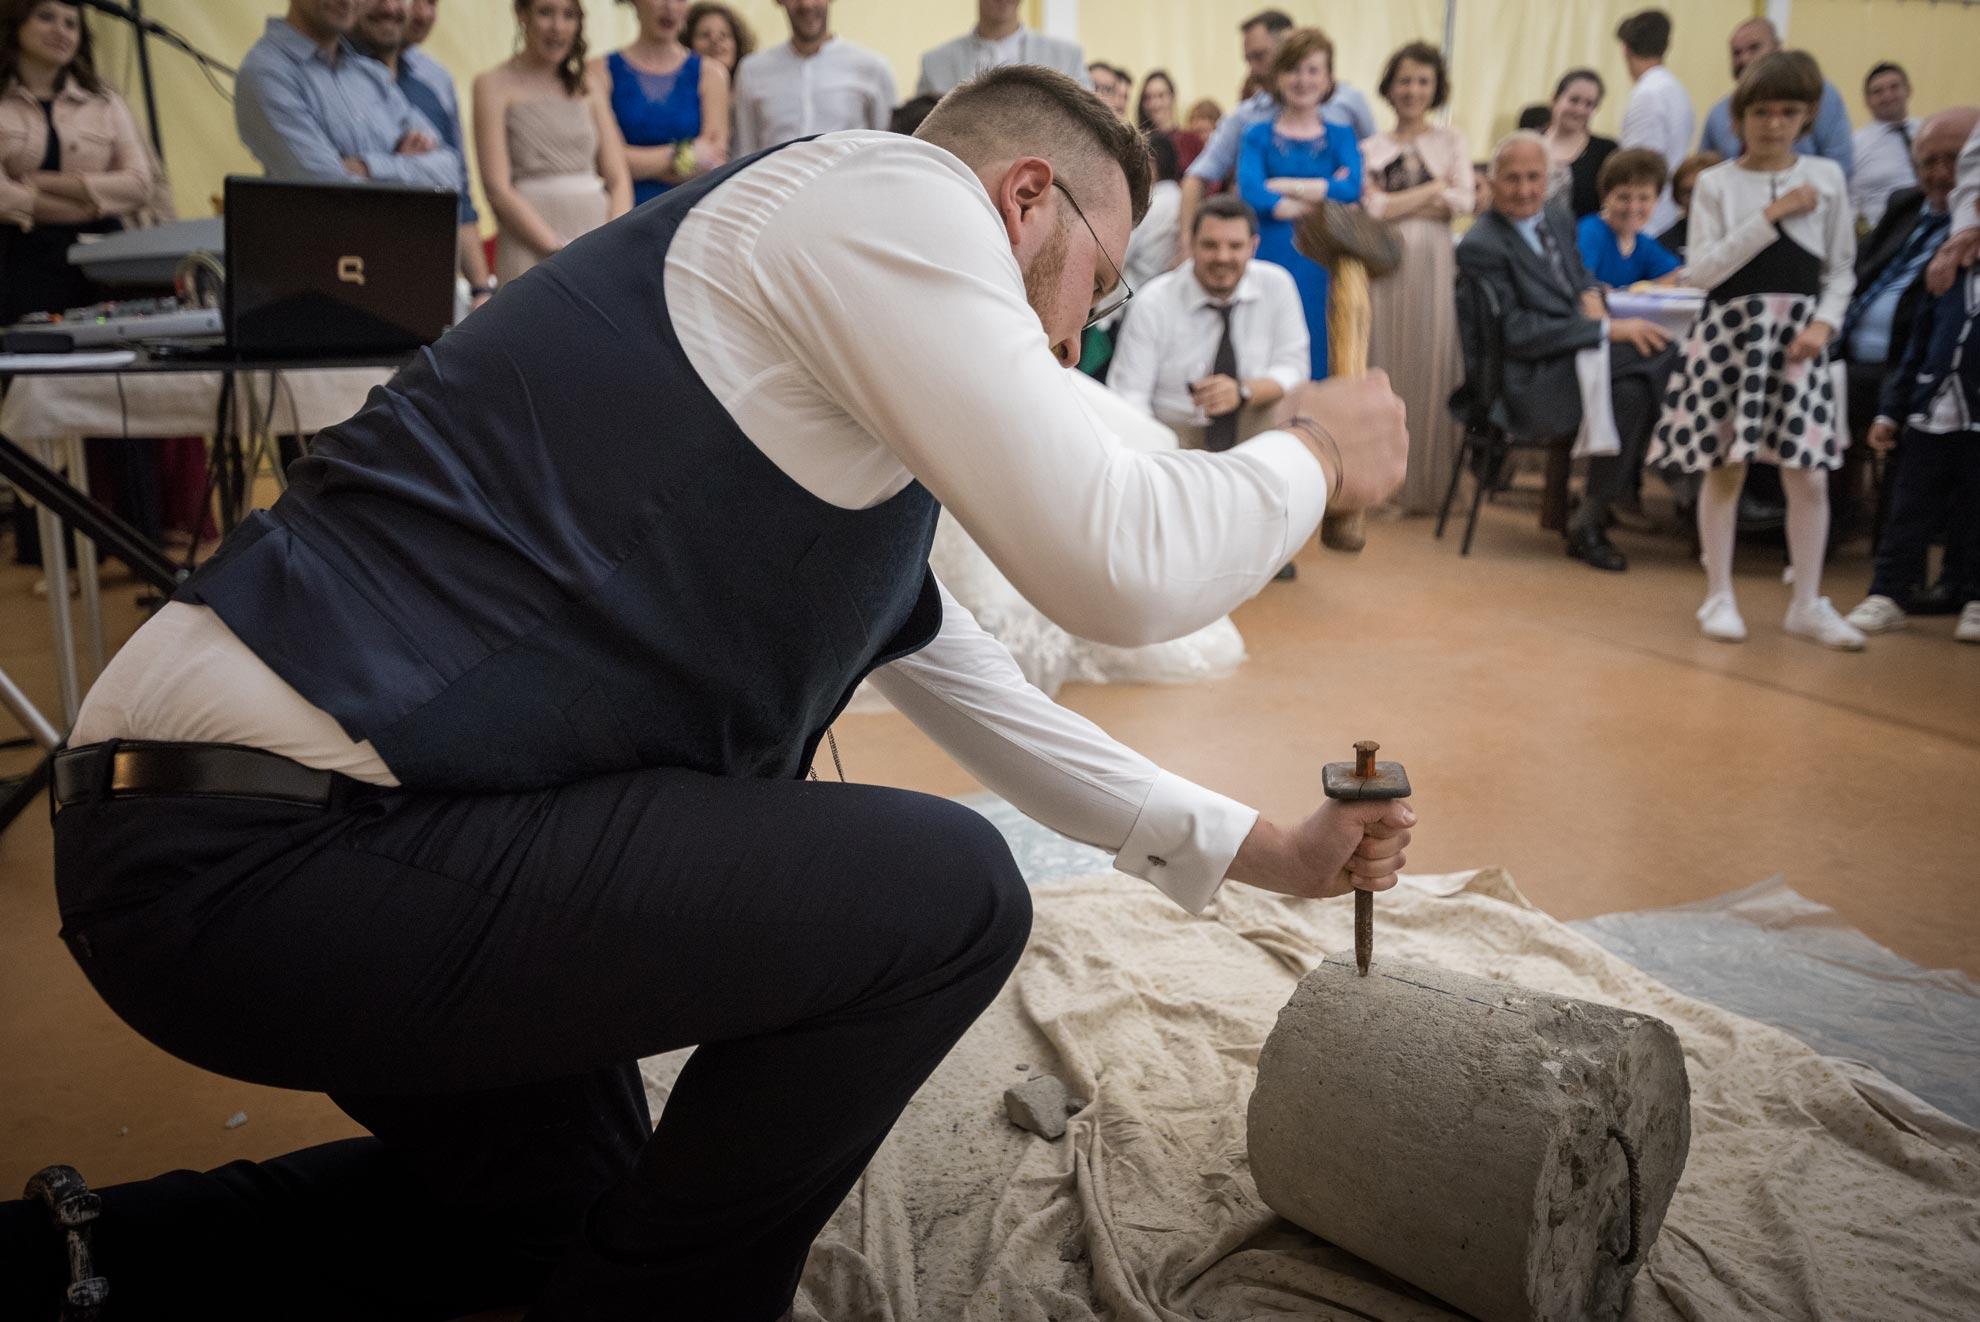 Matrimonio a Narzole Lorenza Diego - DSC 0826 - Fotografie sposo matrimonio - Fotografie sposo matrimonio